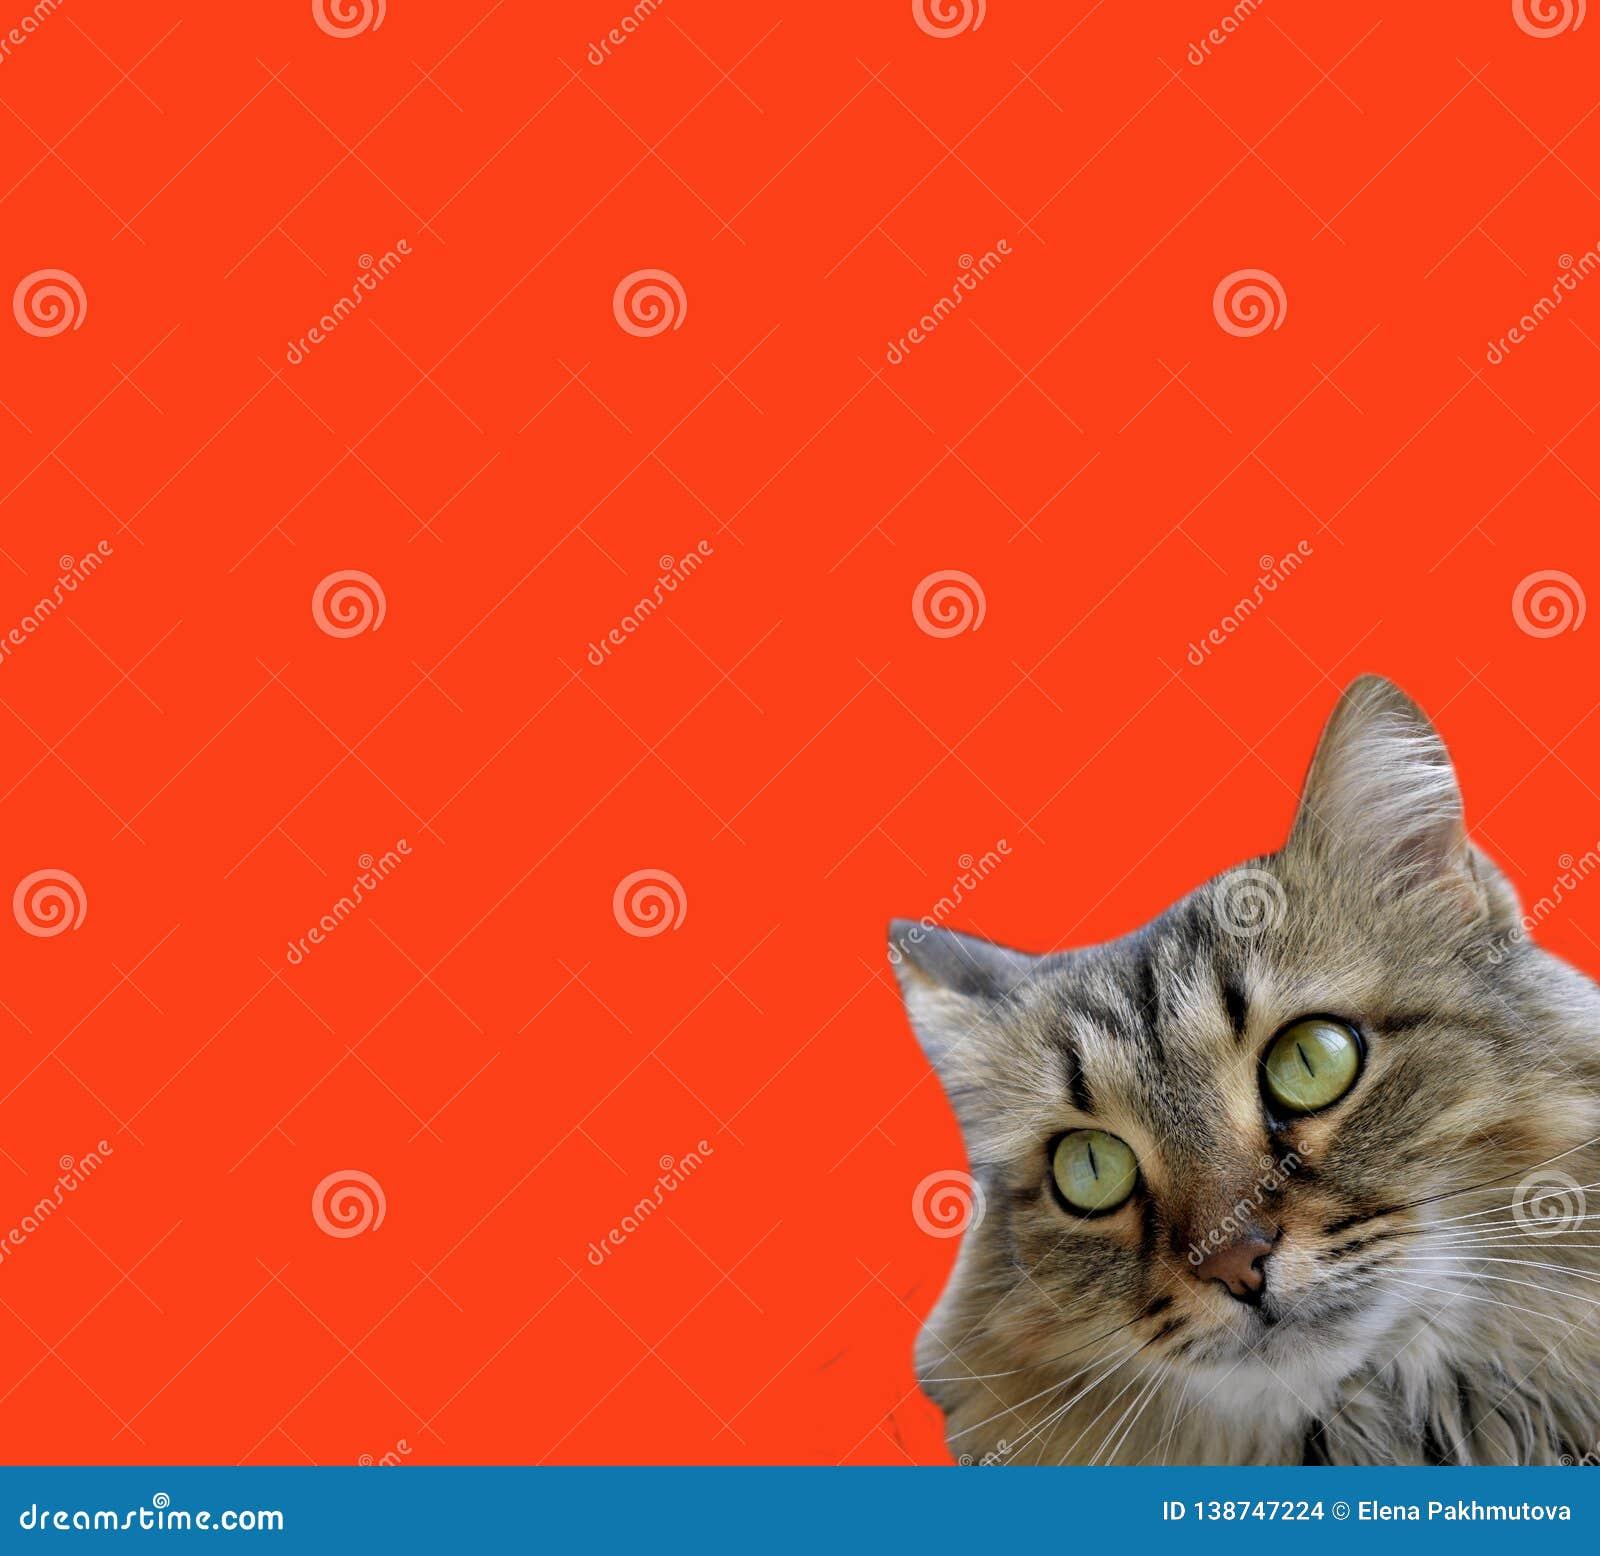 Cat, animal, pet, kitten, feline, domestic, fur, cute, pets, eyes, portrait, animals, white, gray, eye, isolated, kitty, mammal, n